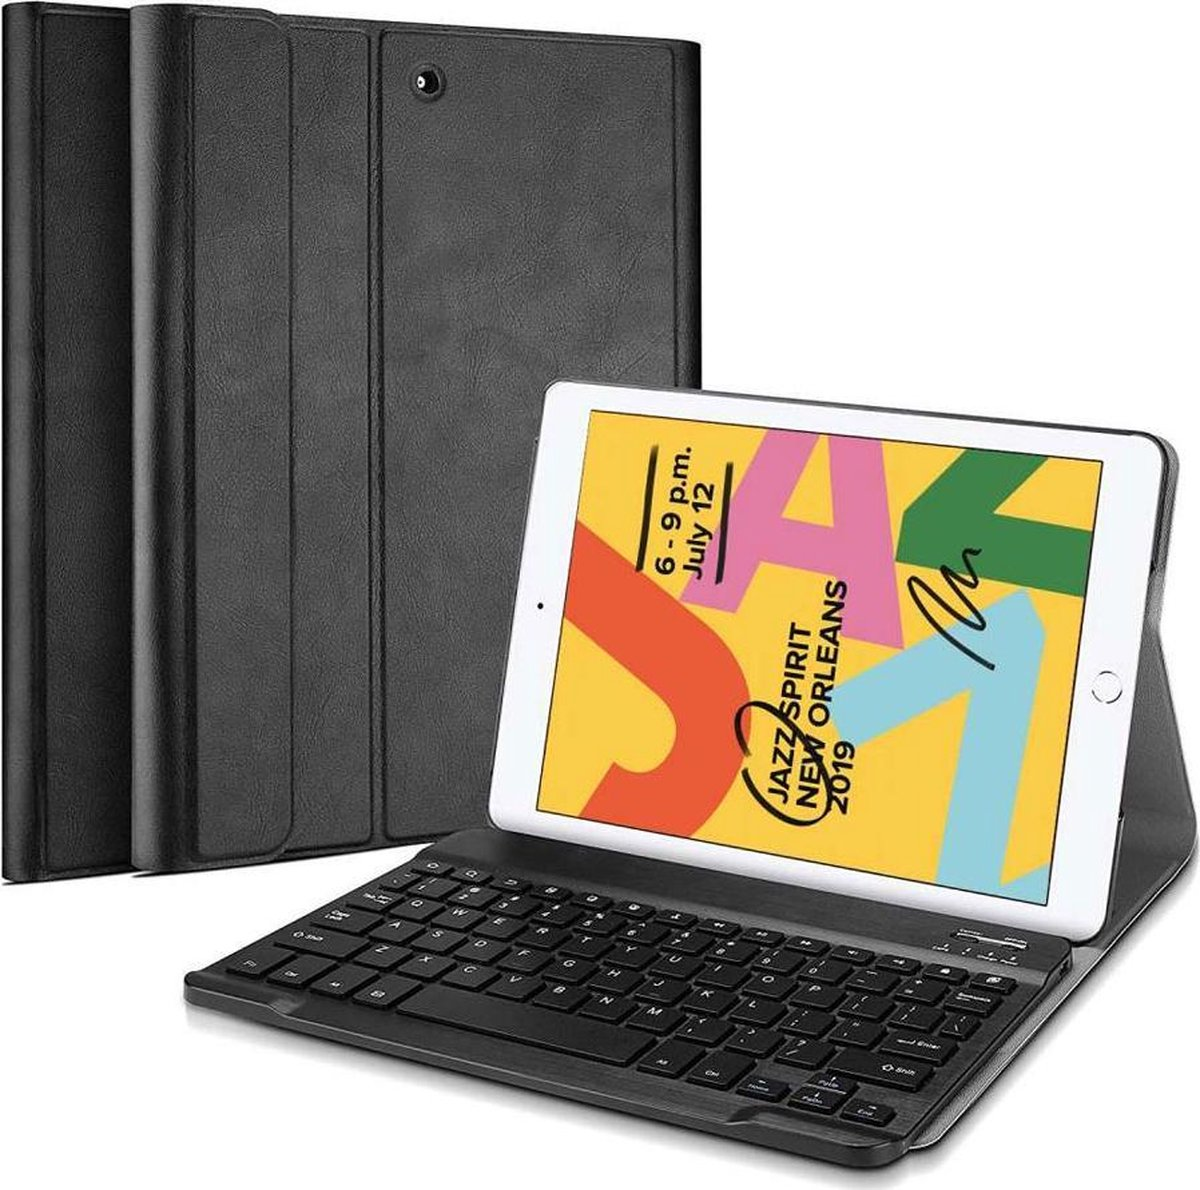 iPad 10.2 (2020)iPad 10.2 (2019) Toetsenbord Hoes hoesje Just in Case Effen Zwart Kunstleer